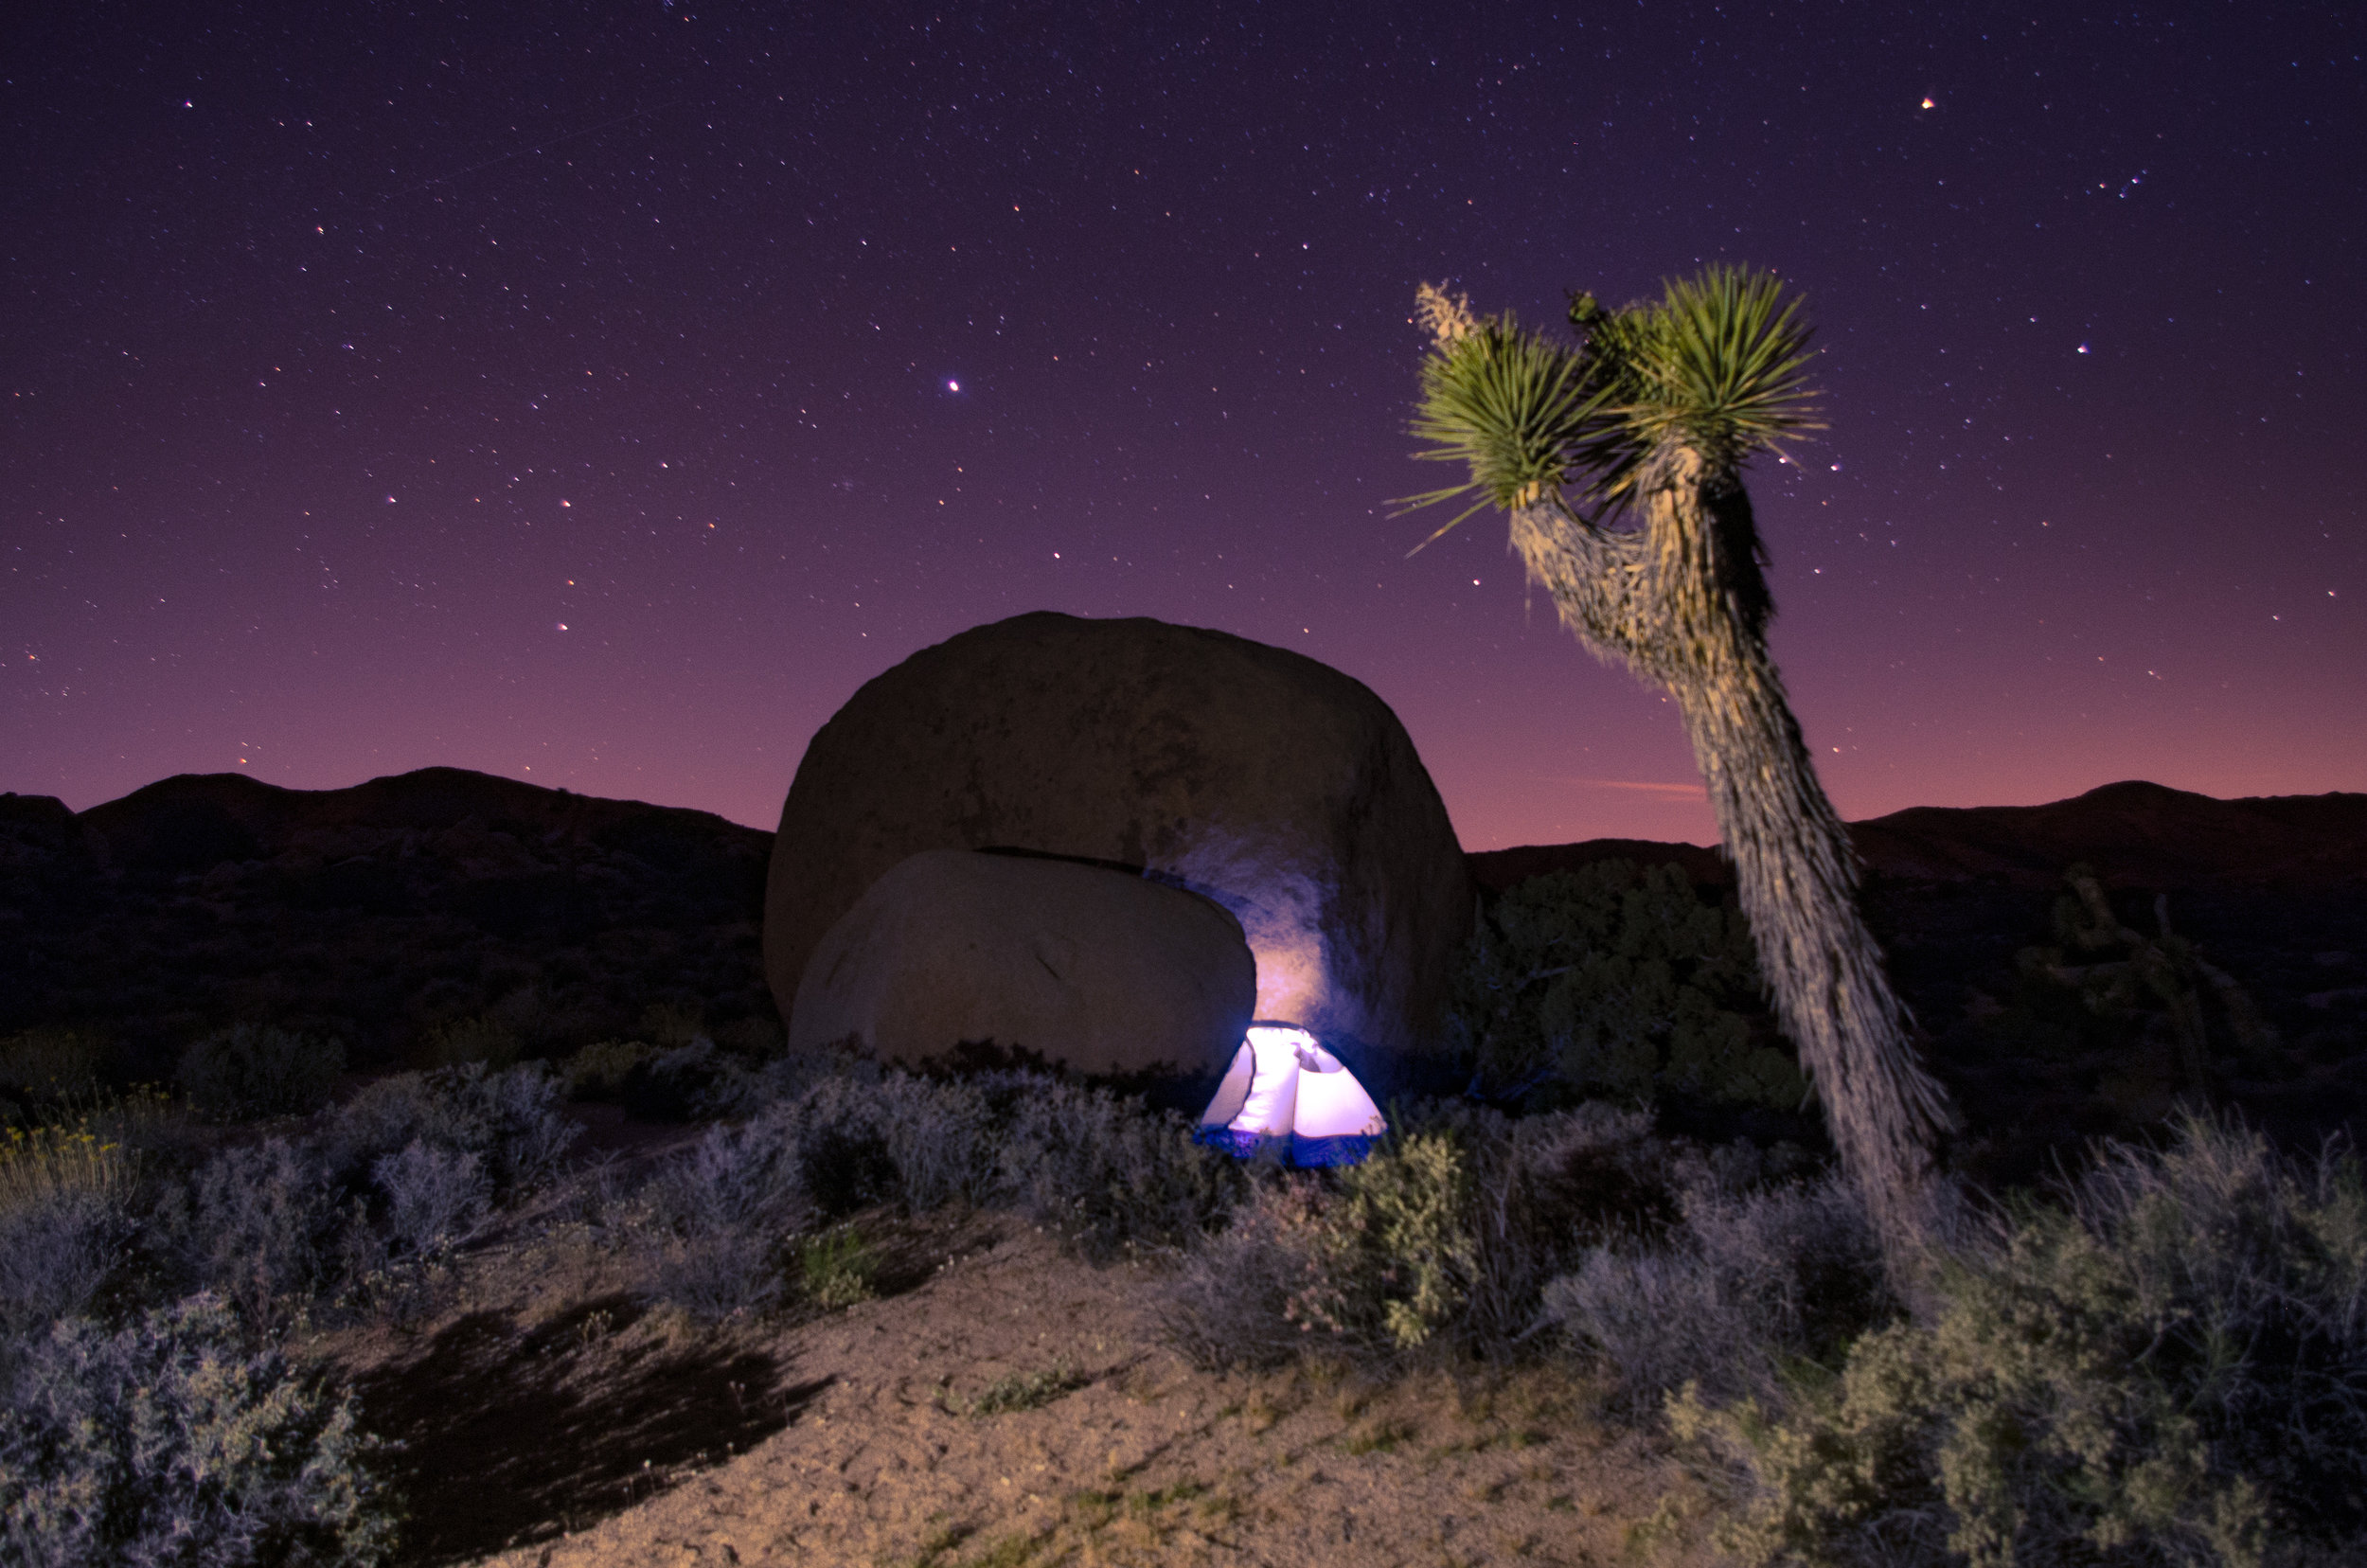 My first tent under the stars. Joshua Tree National Park, California.